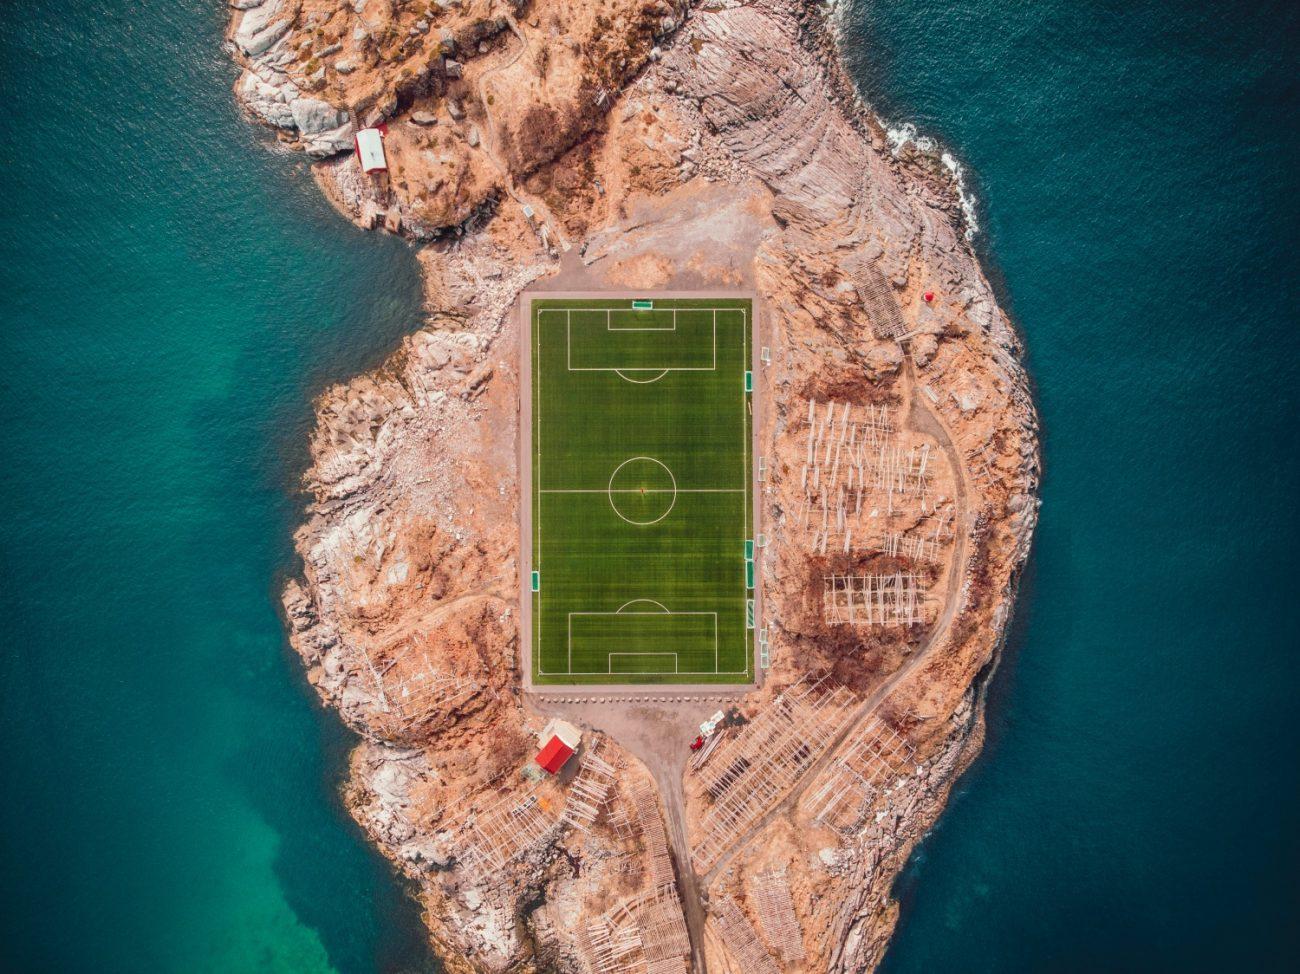 Fußballfeld im Meer